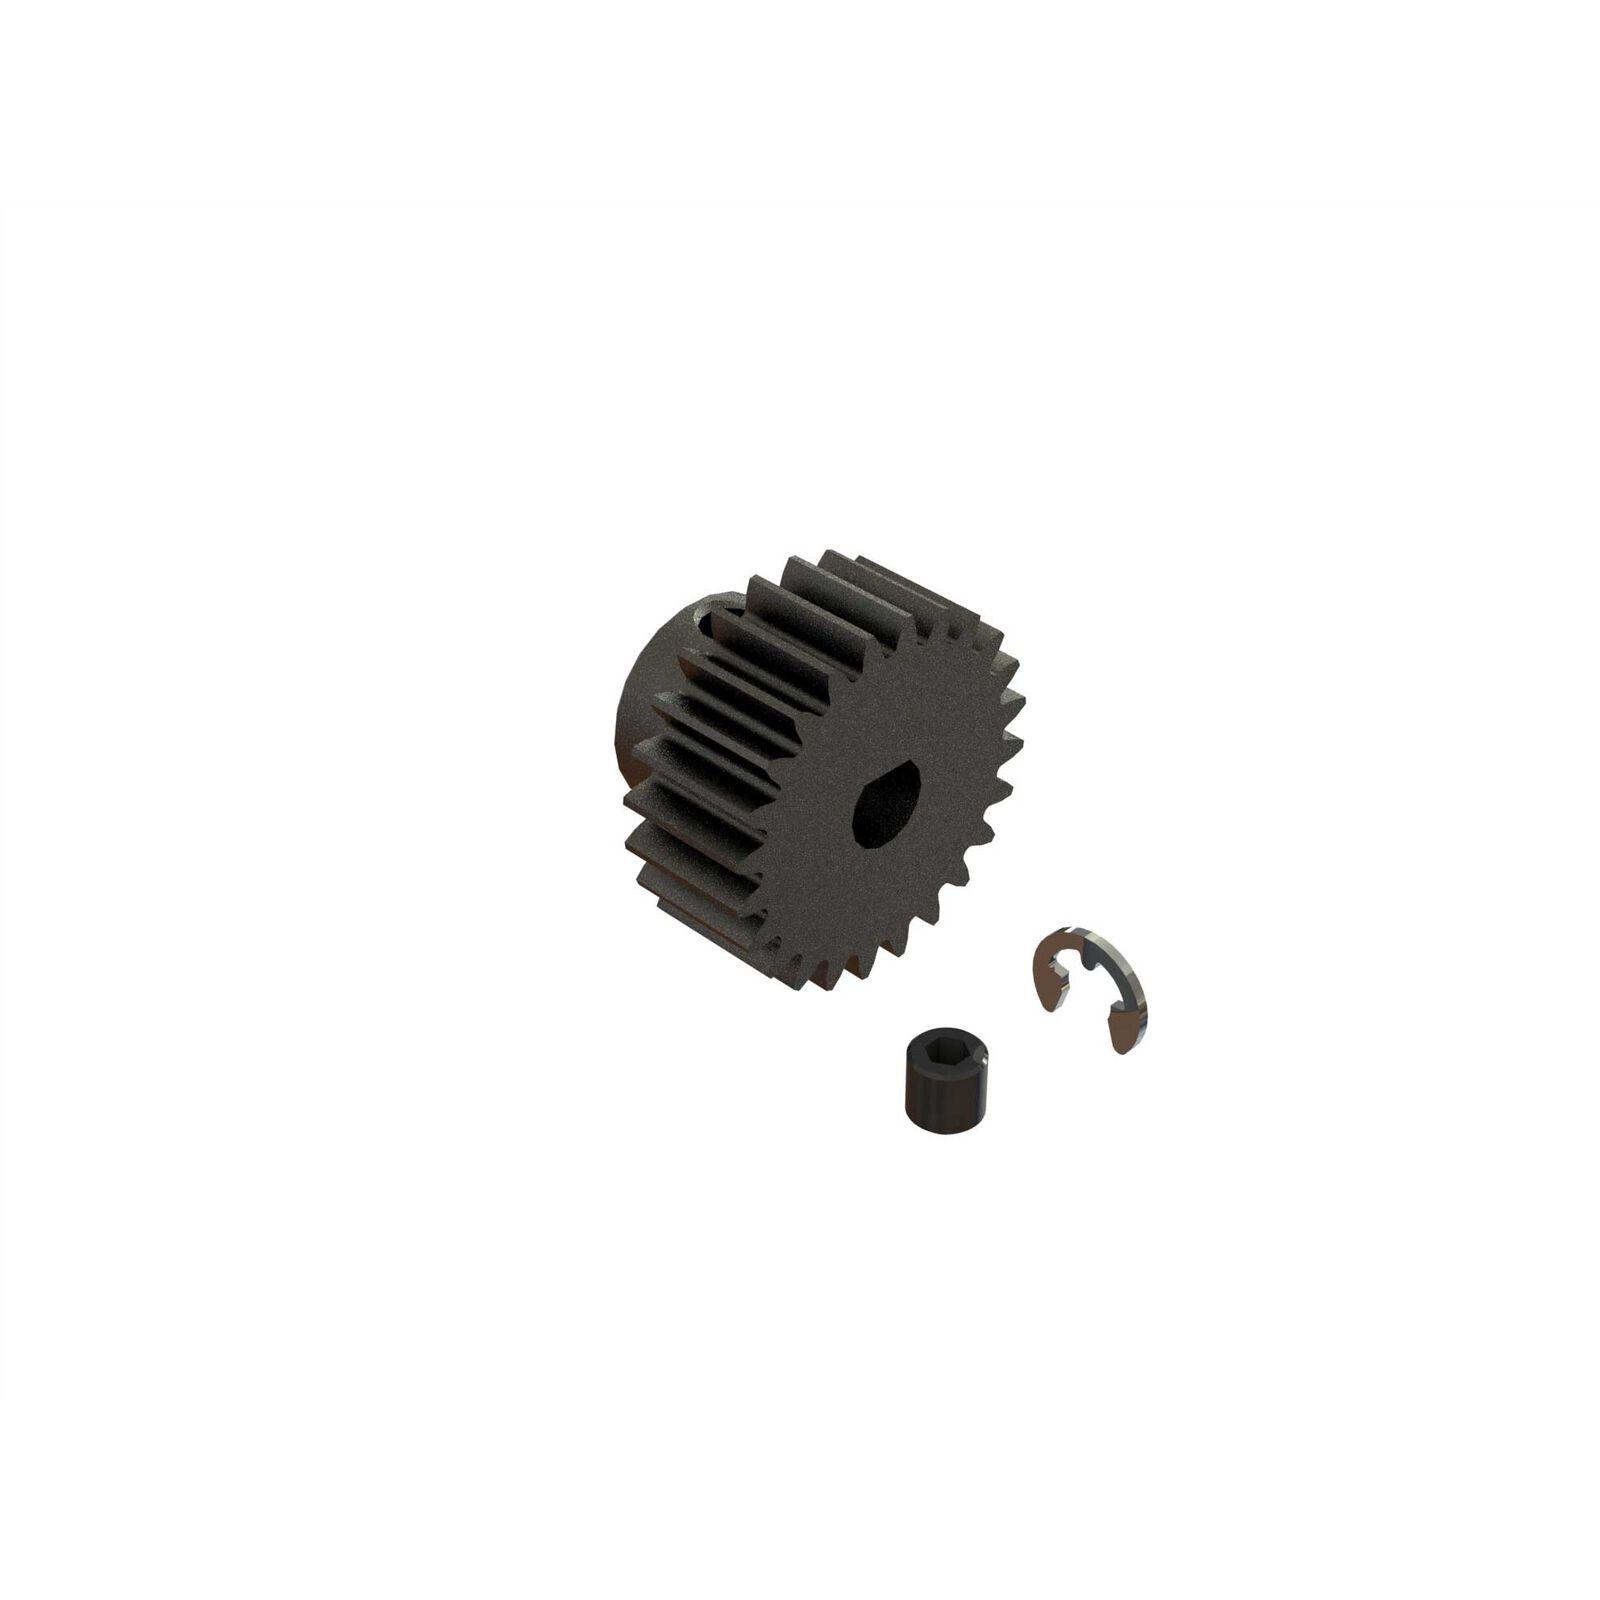 24T 0.8Mod Safe-D5 Pinion Gear